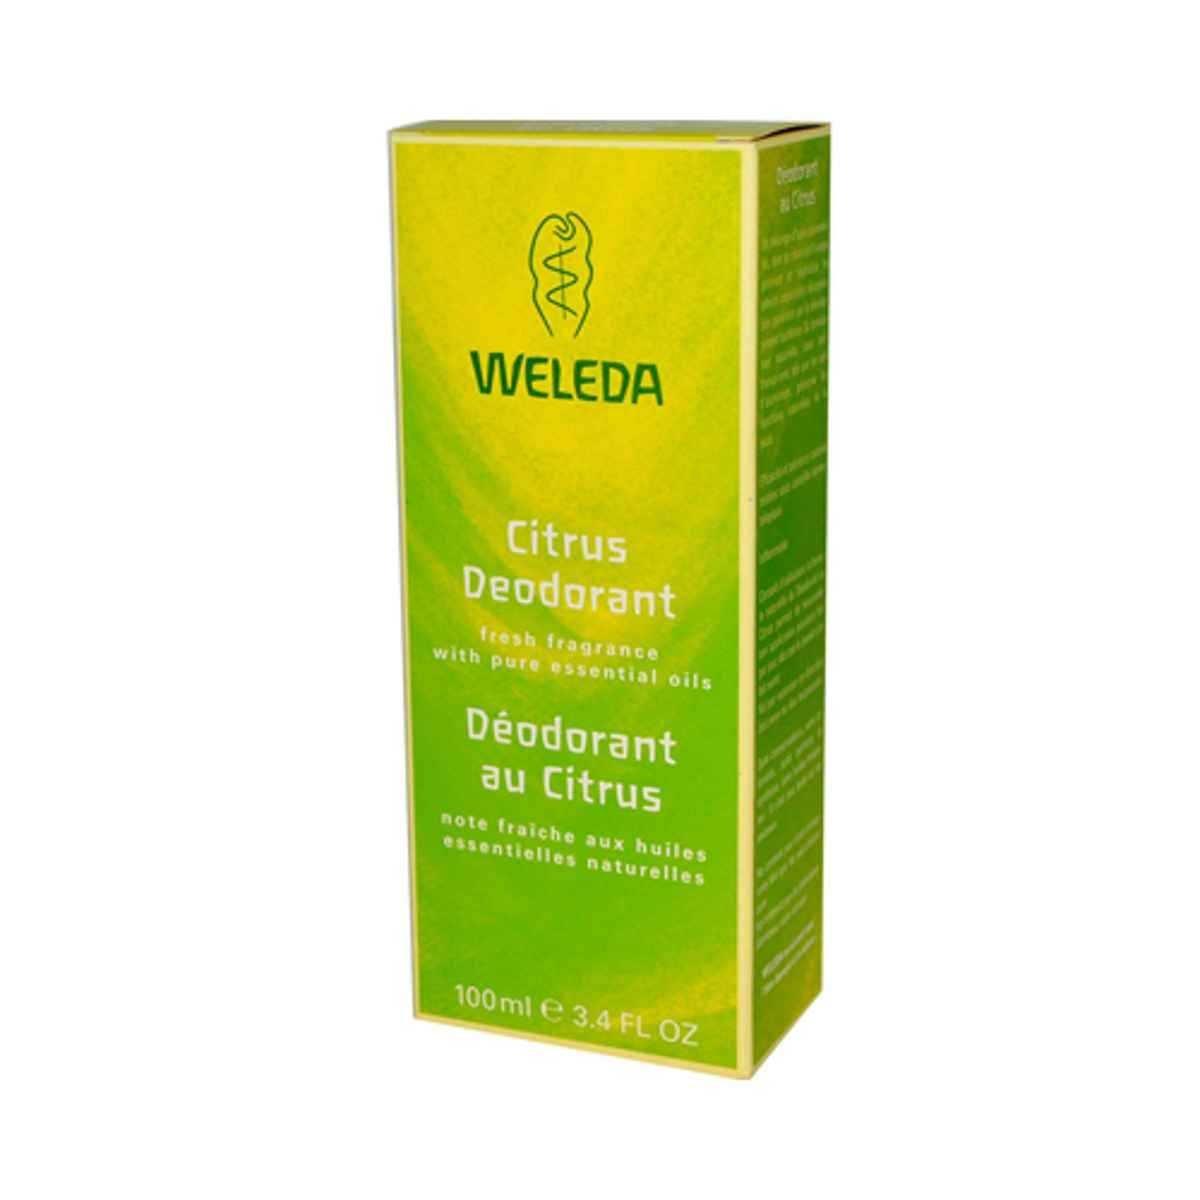 Weleda, Deodorant, Citrus, 3.4 oz Spray